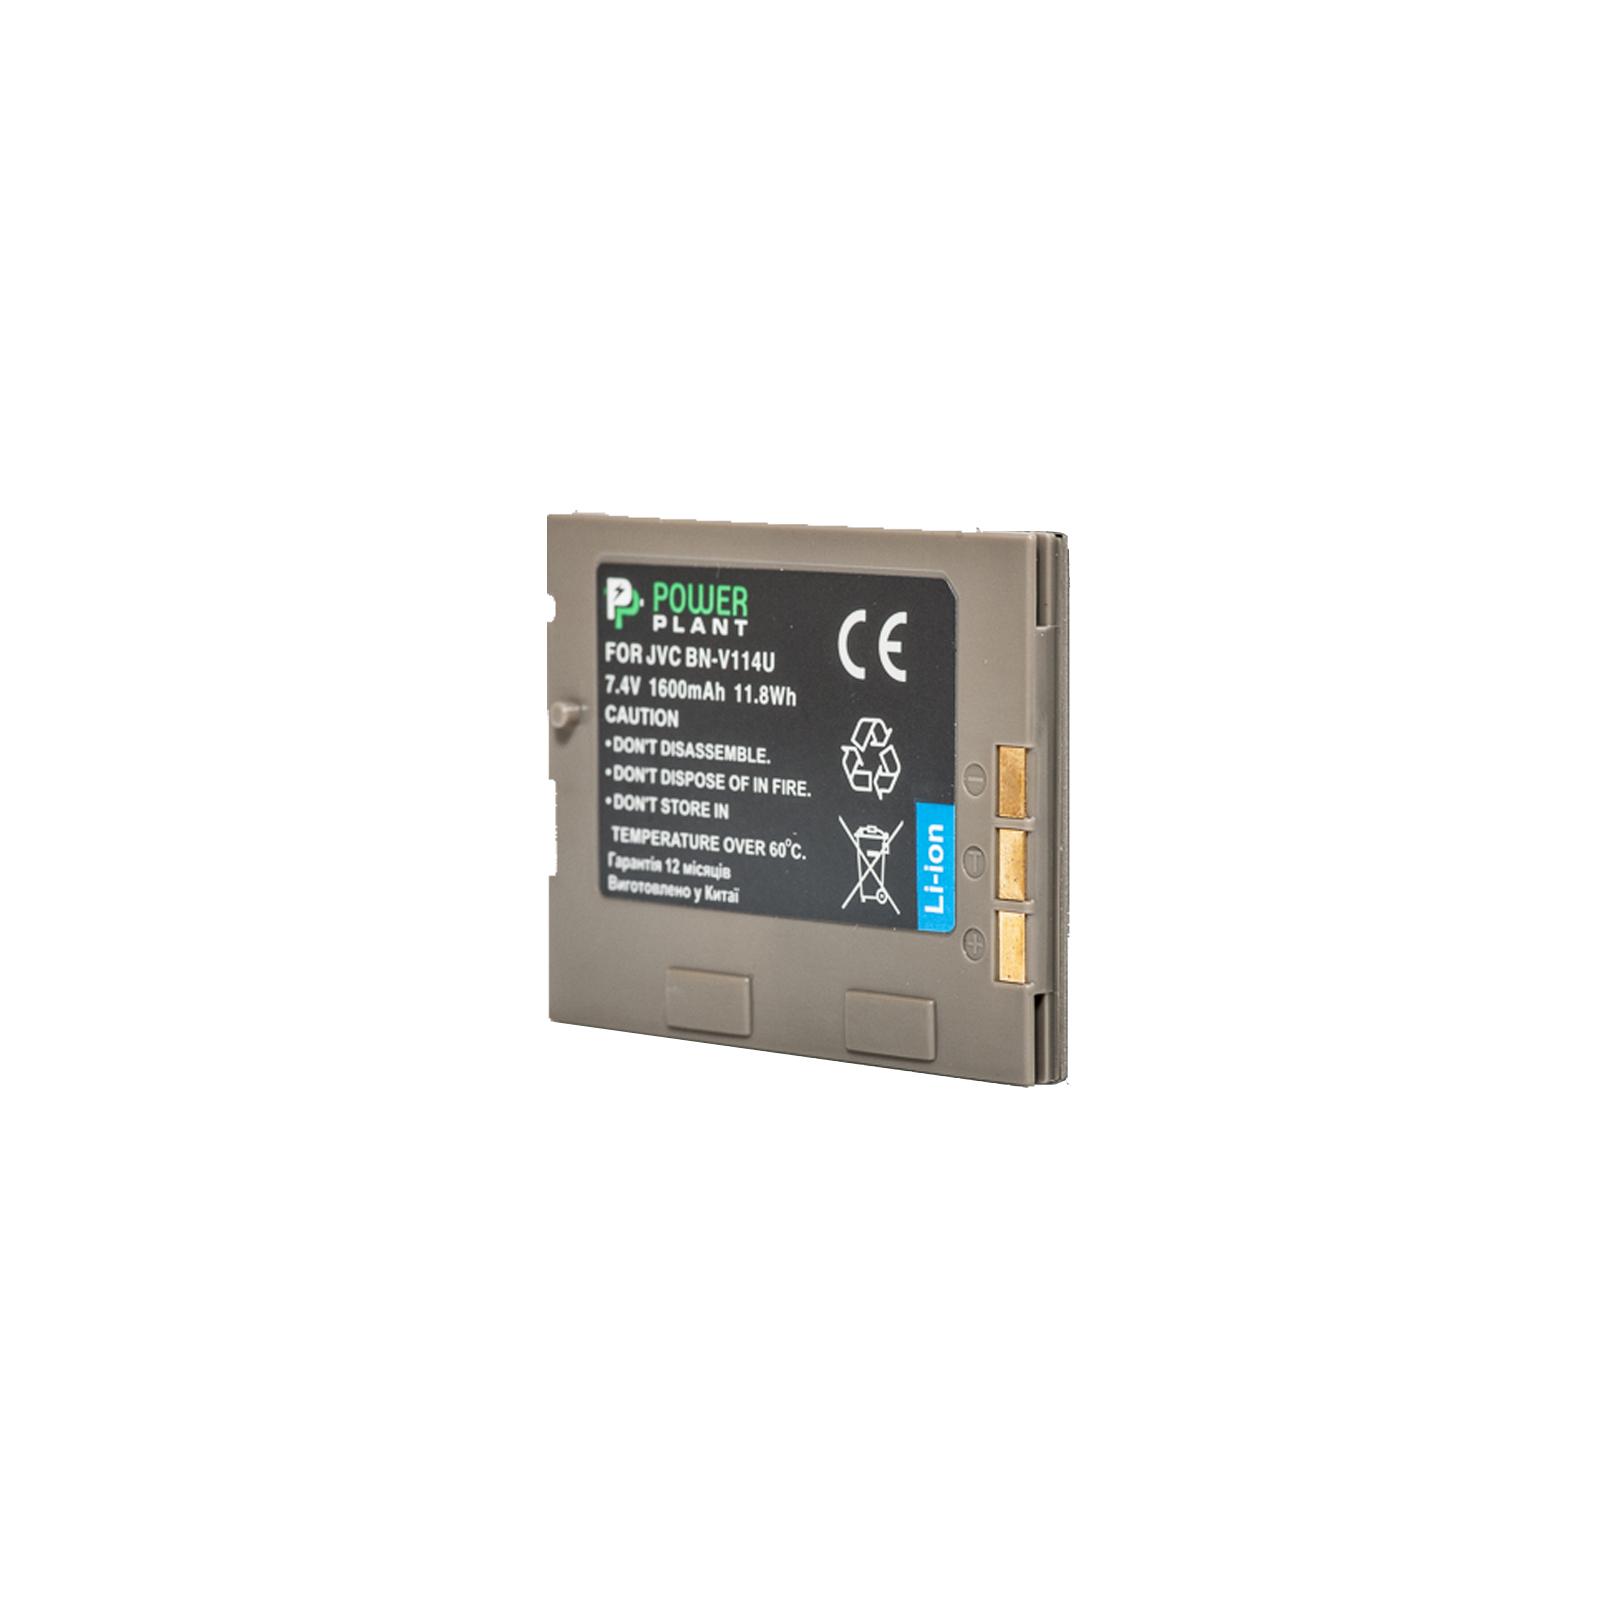 Аккумулятор к фото/видео PowerPlant JVC BN-V114U (DV00DV1356)